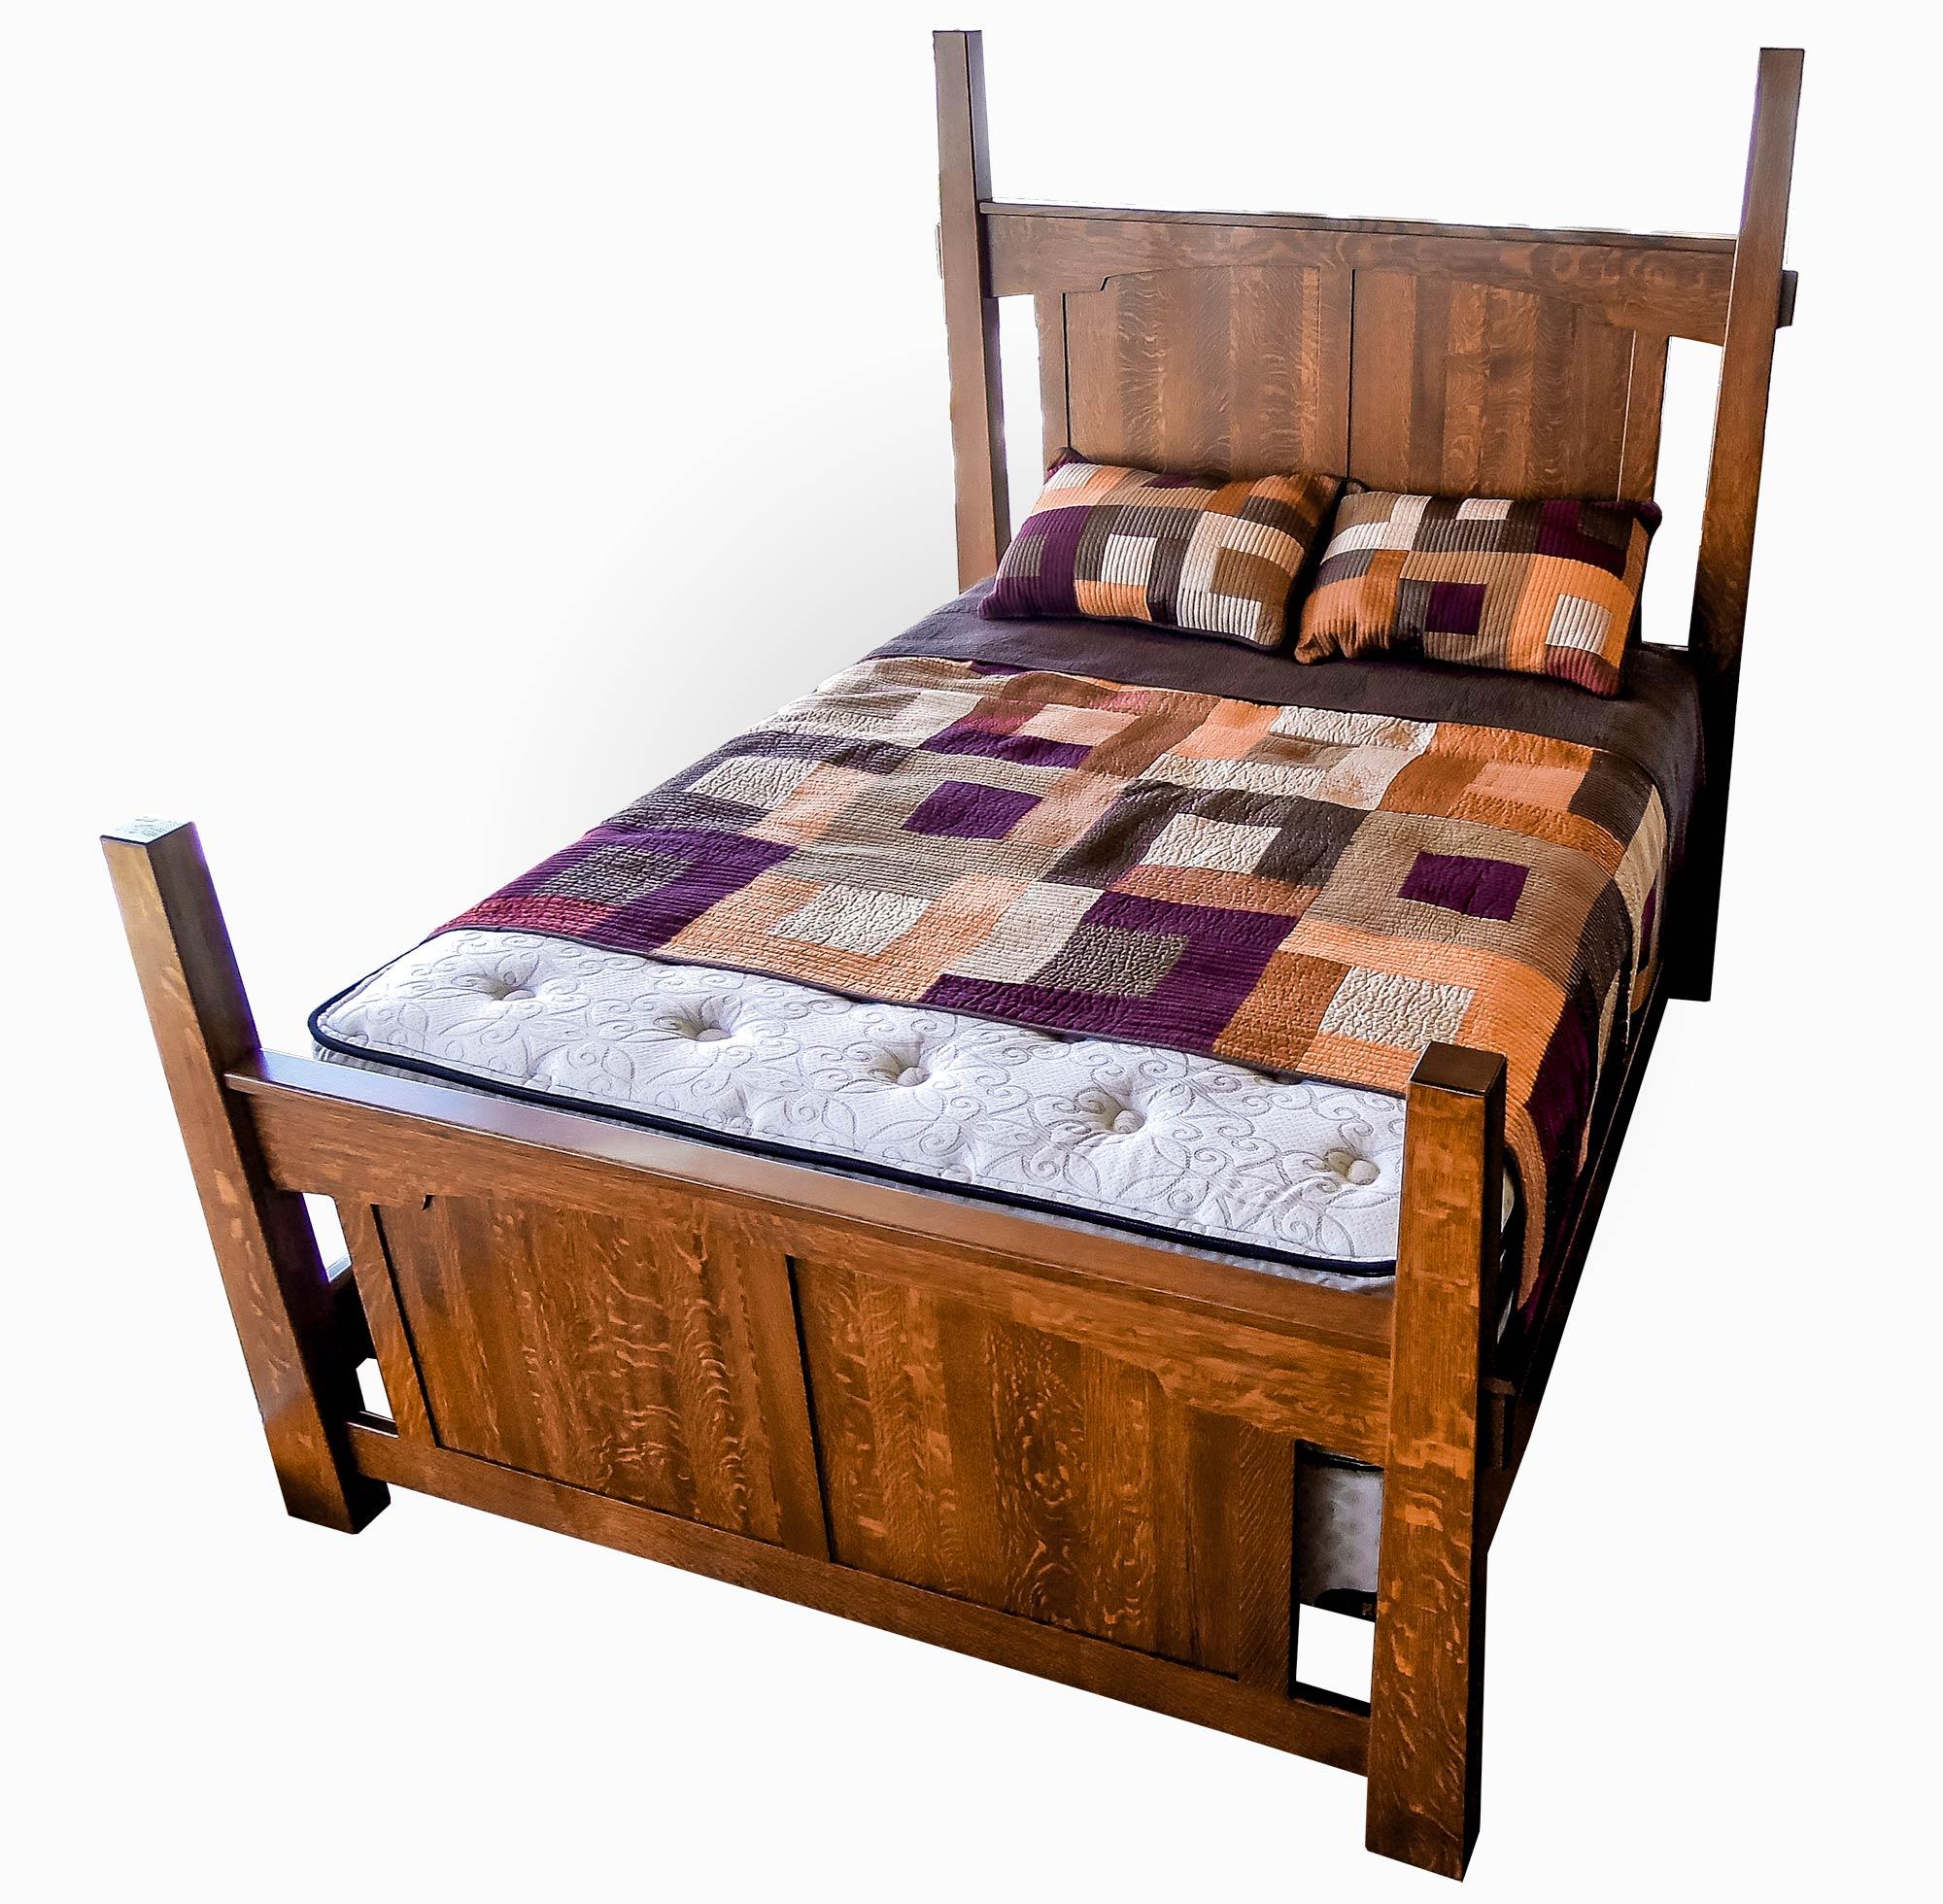 colusa-bed.jpg